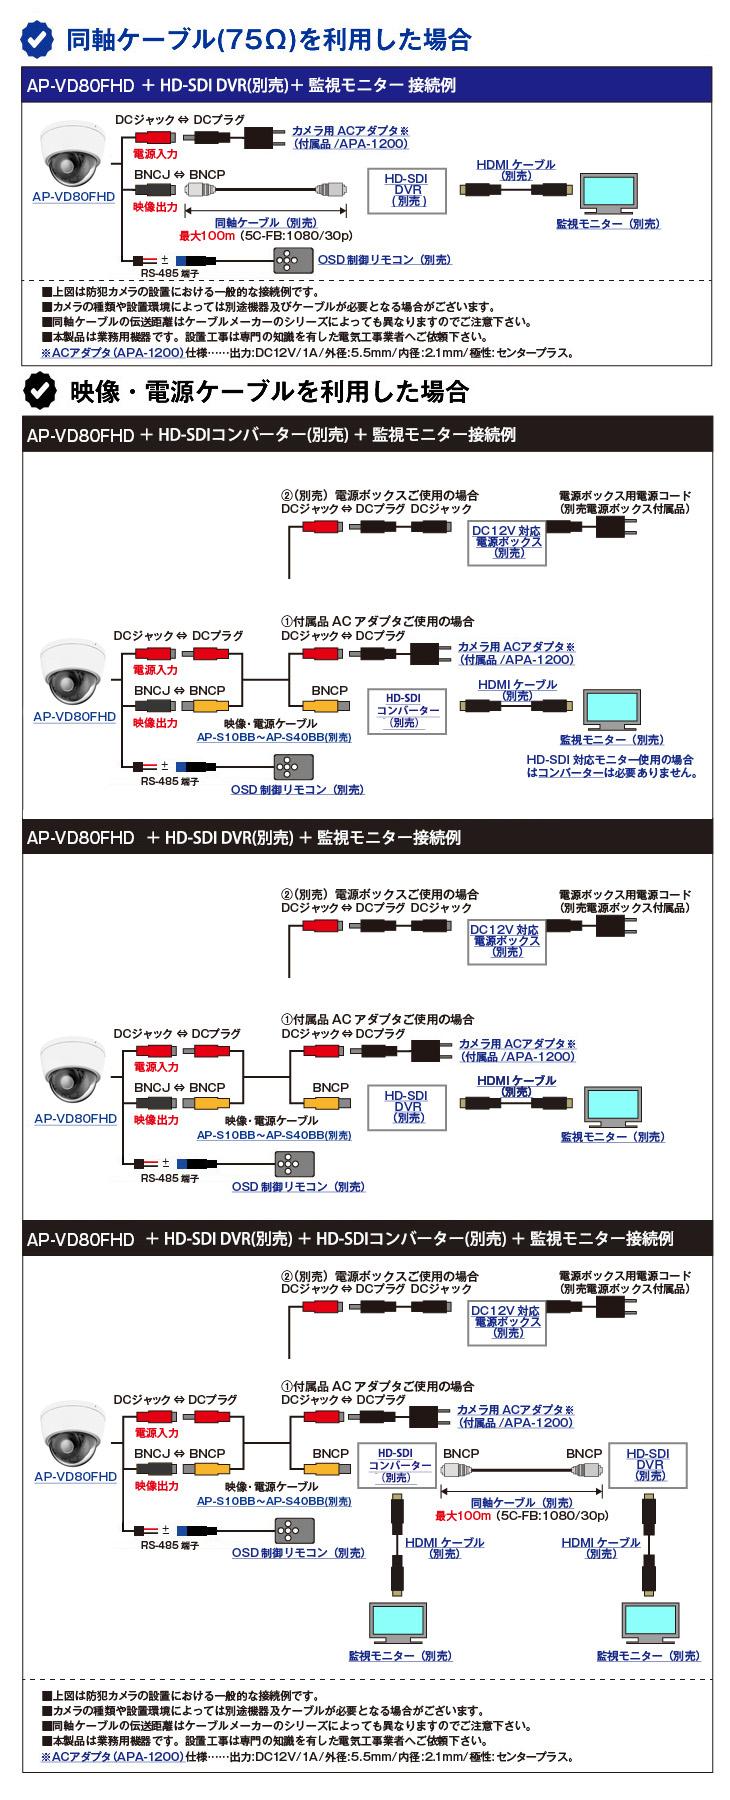 EX-SDI 213万画素防犯カメラ(AP-VD80FHD)の接続イメージ